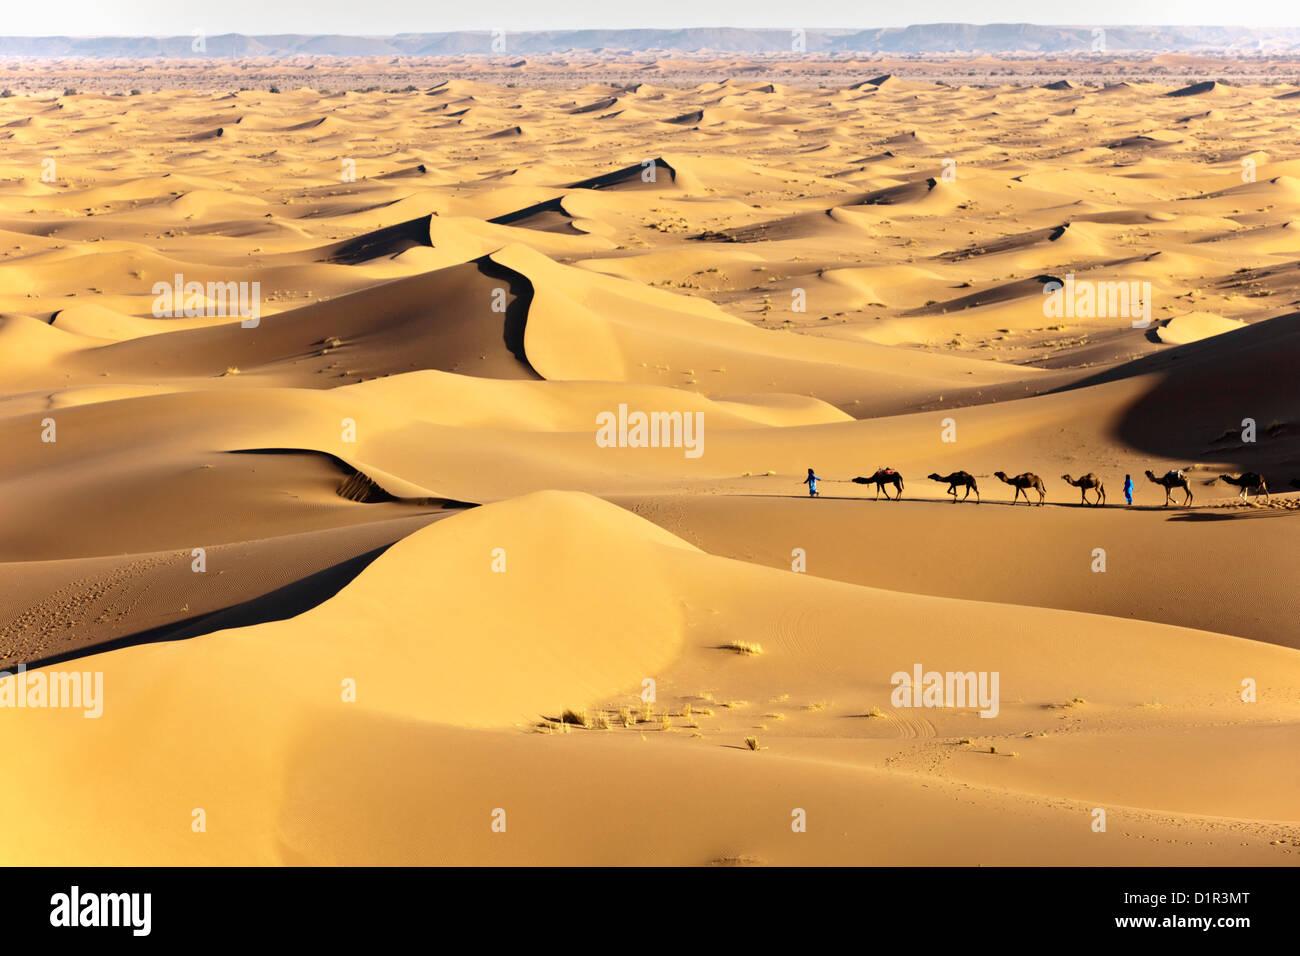 Morocco, M'Hamid, Erg Chigaga sand dunes. Sahara desert. Camel drivers and camel caravan. Stock Photo